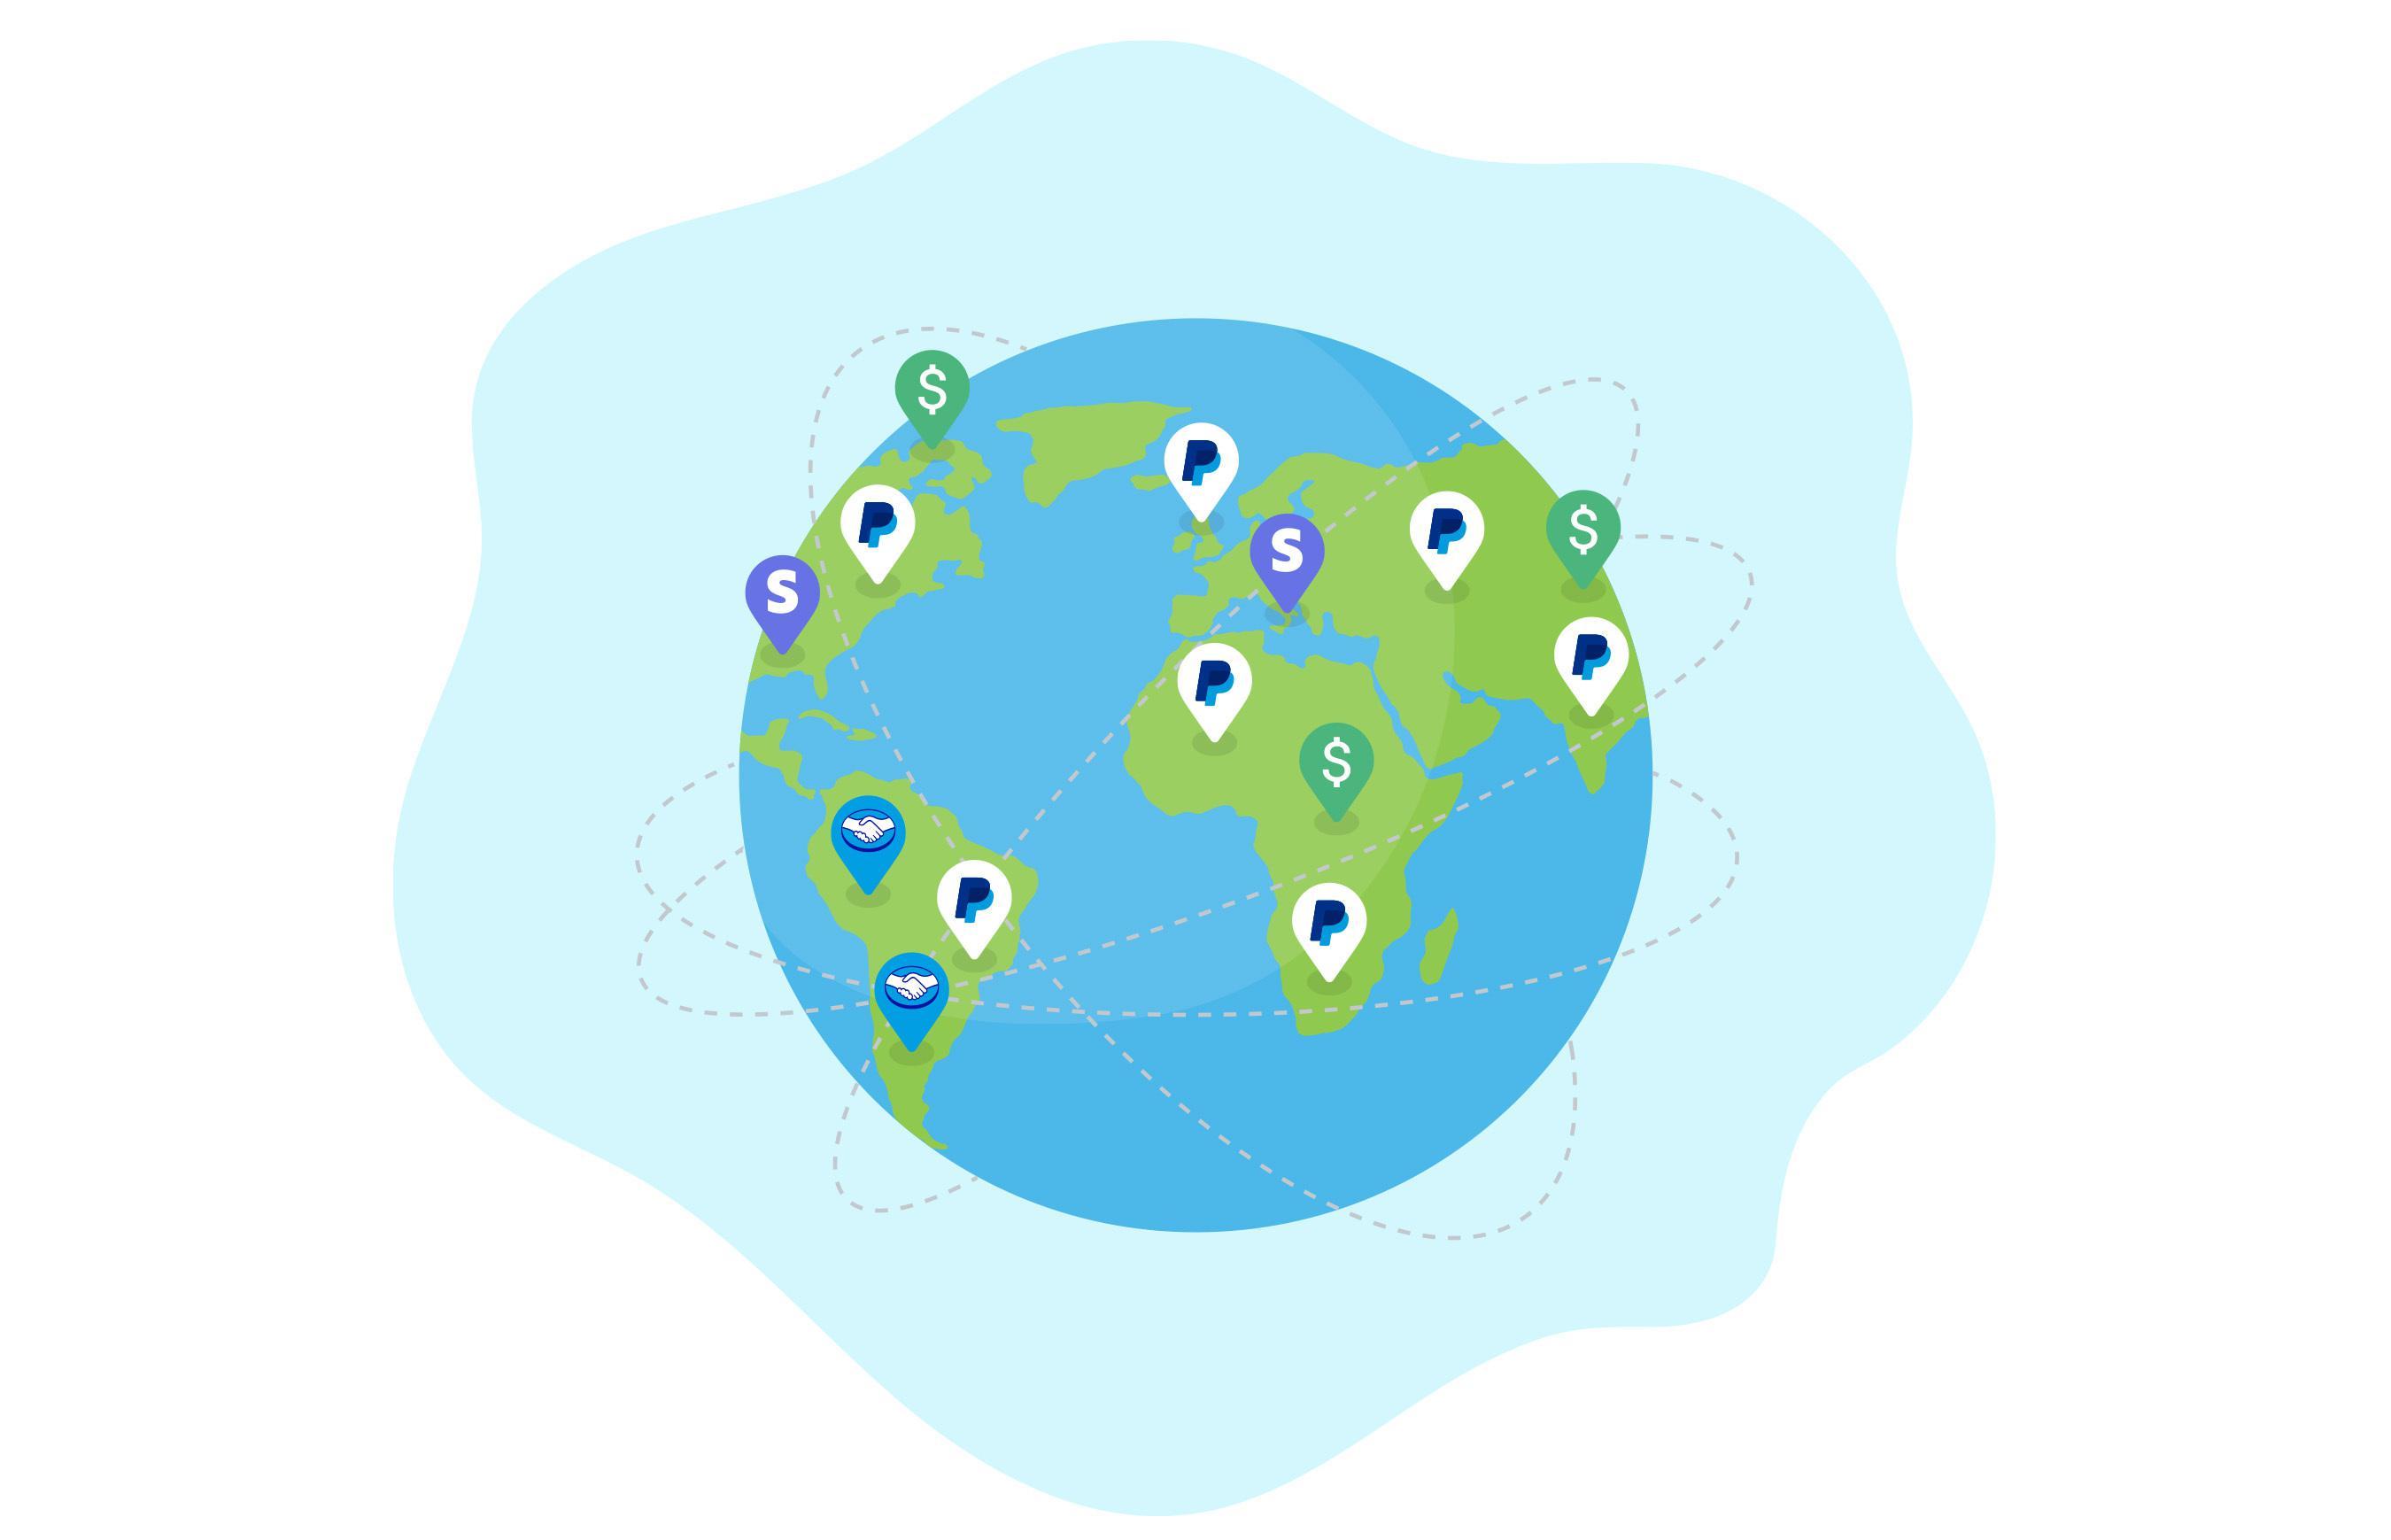 GoodBarber Shopping App: Monedas y Pasarelas de pago